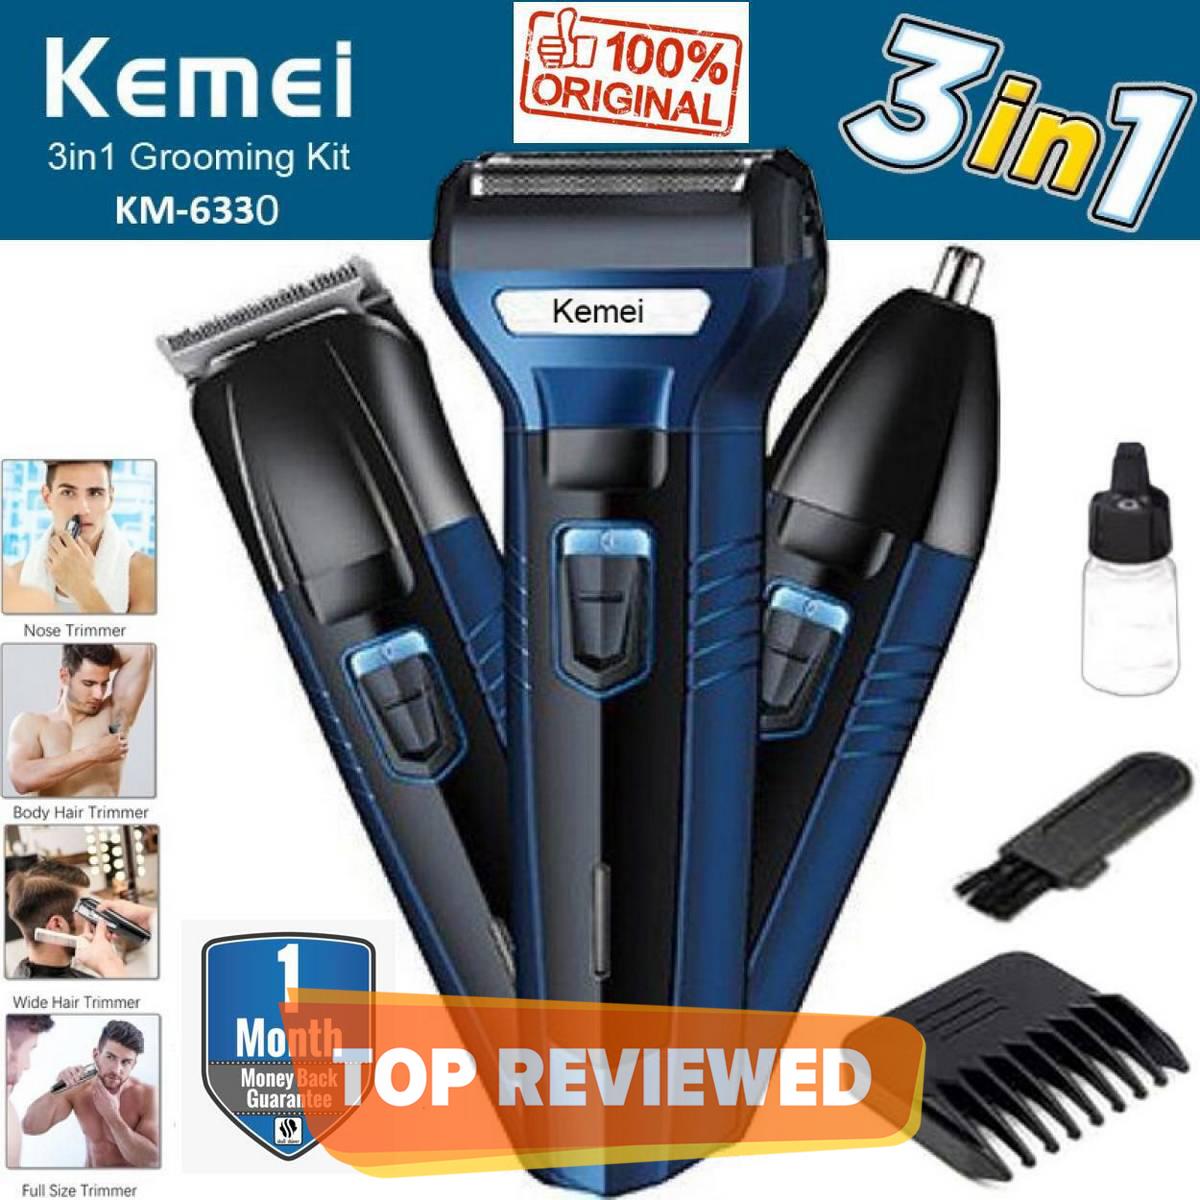 Kemei 3 In 1 km 6331 Rechargeable Hair Clipper Shaver beard Styling Hair Removal machine shaving machine for men -  km-6330/6558/6331 - black